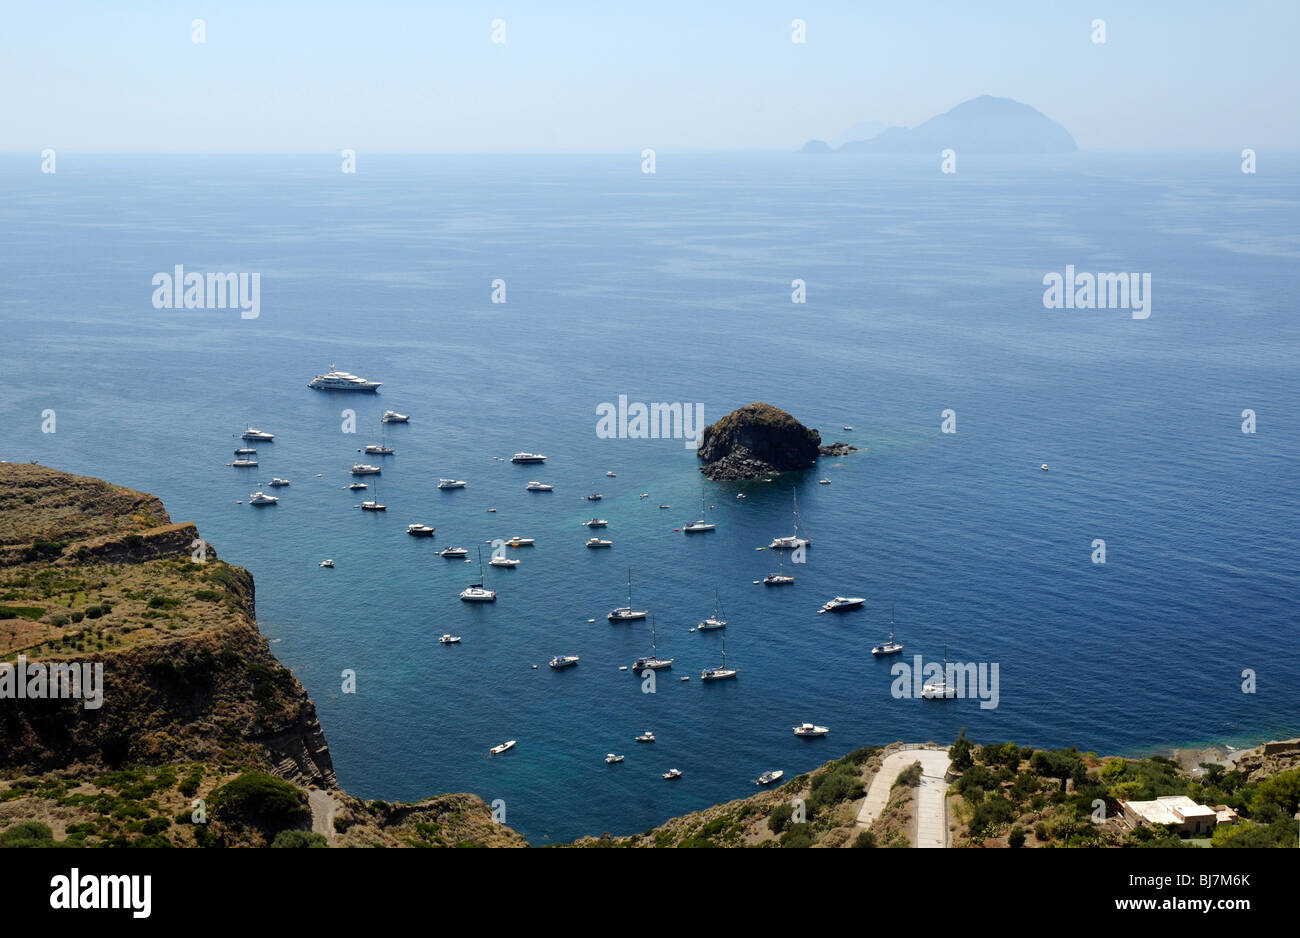 A view of the sea below Pollara with the Island of Filicudi on the horizon, Salina, Aeolian Islands, Italy. Stock Photo